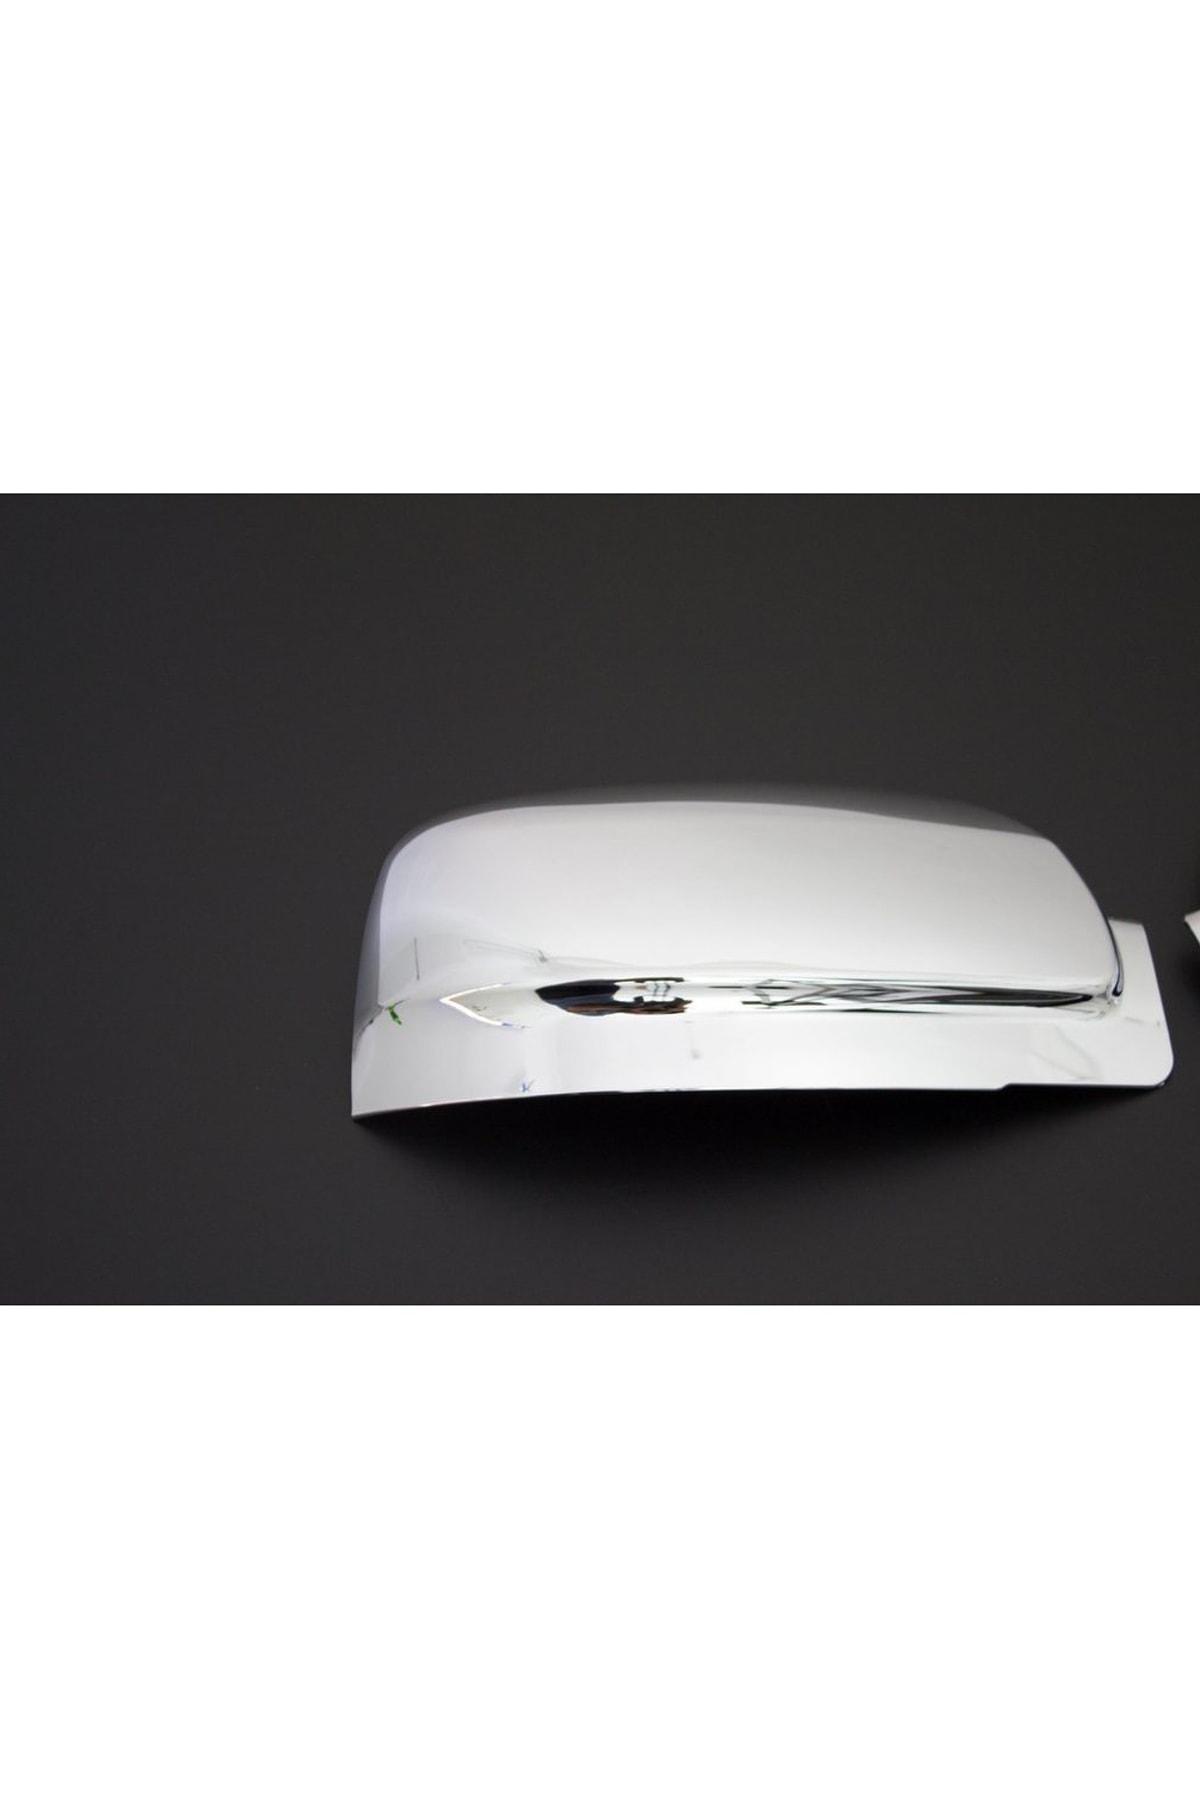 Omsa Mercedes Vito W639 Krom Ayna Kapağı 2 Prç. P.Çelik 2010-2014 2